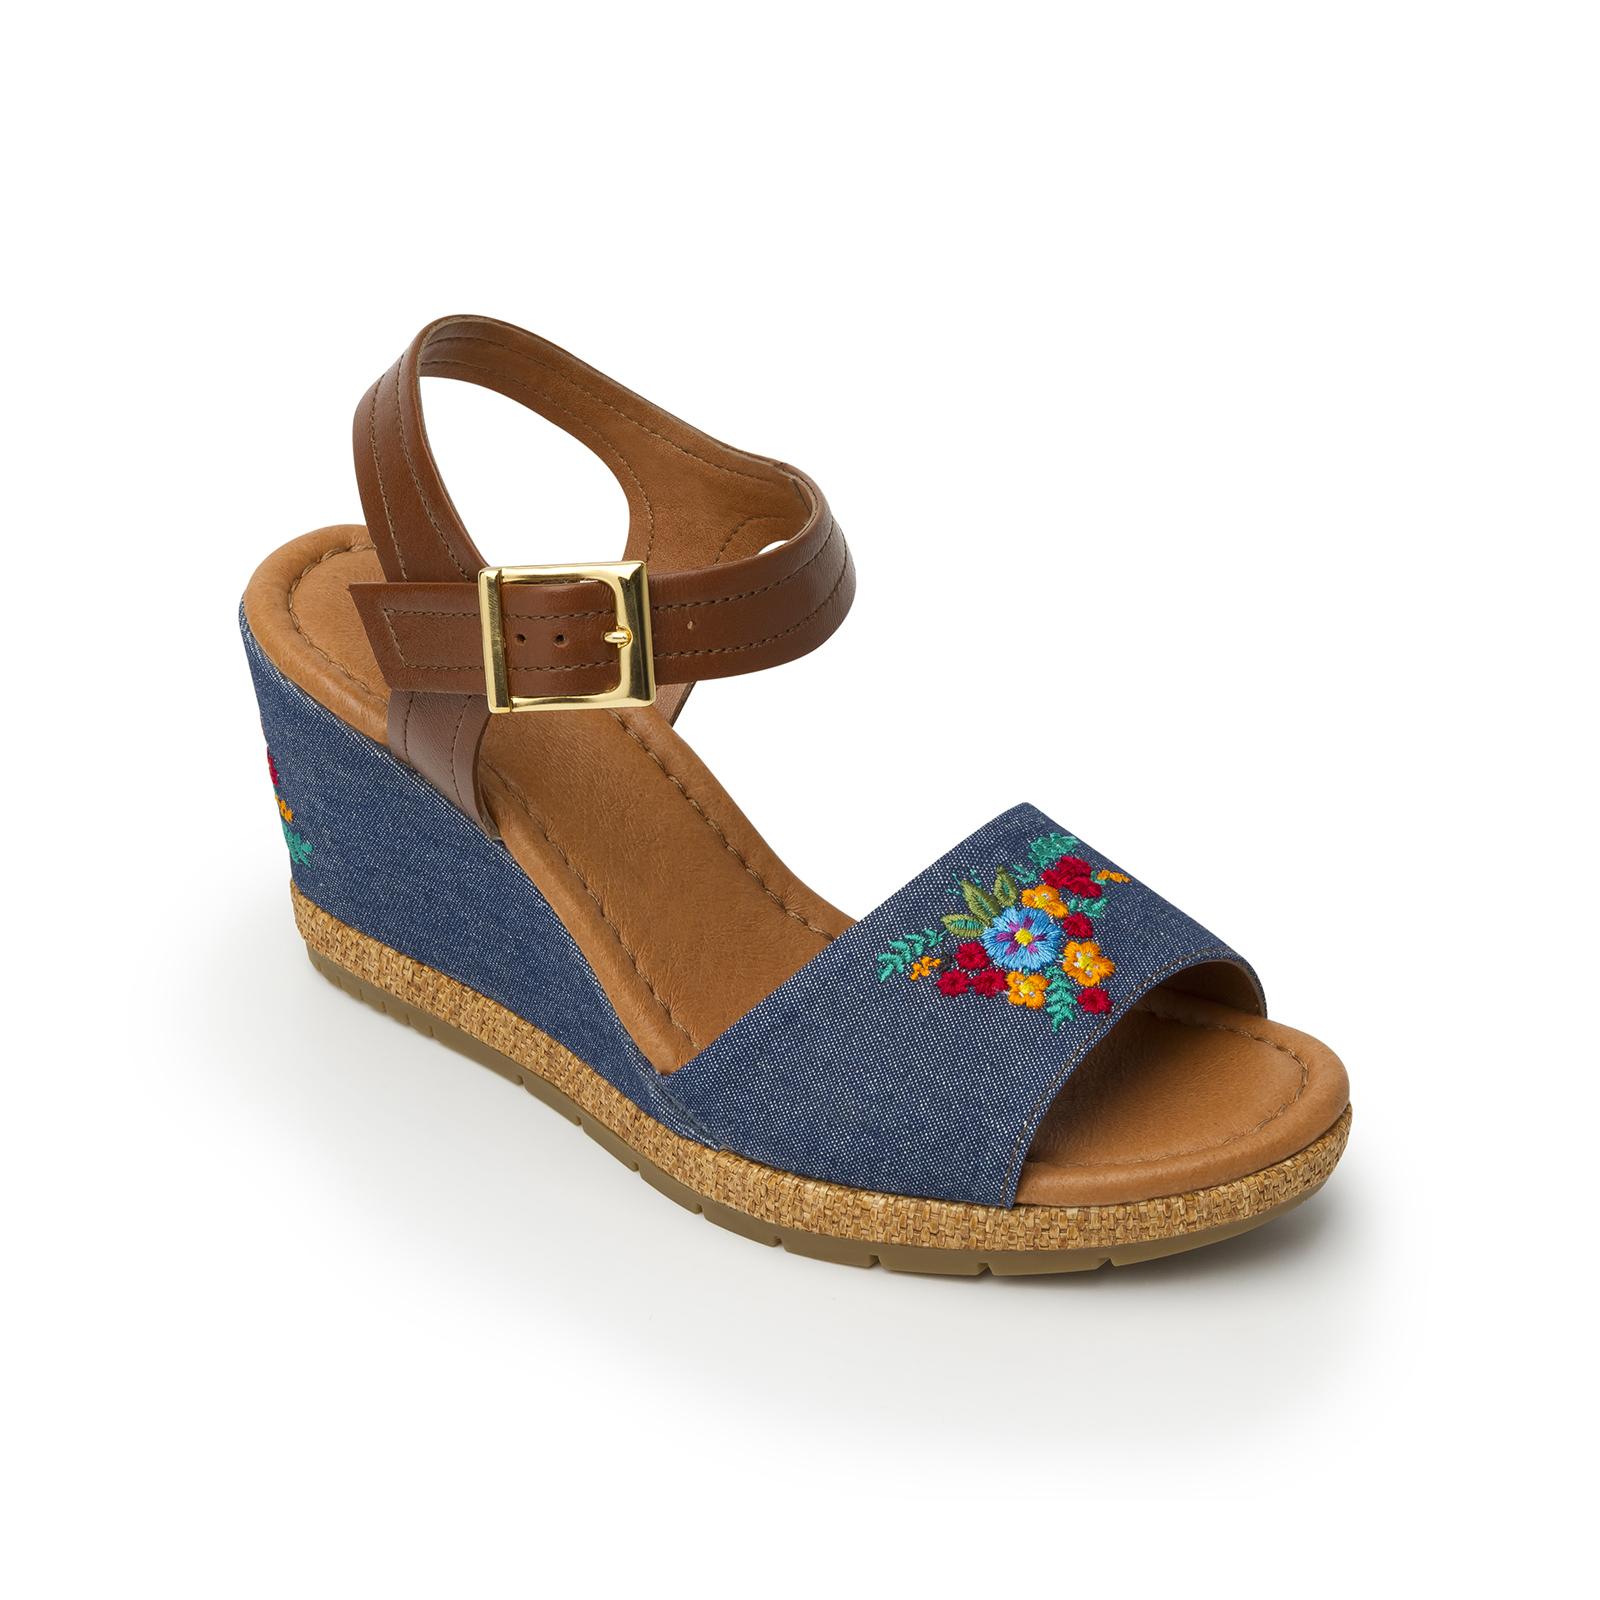 Xilitla 35601 In Blue Denim Women S Sandal Flexi Shoes